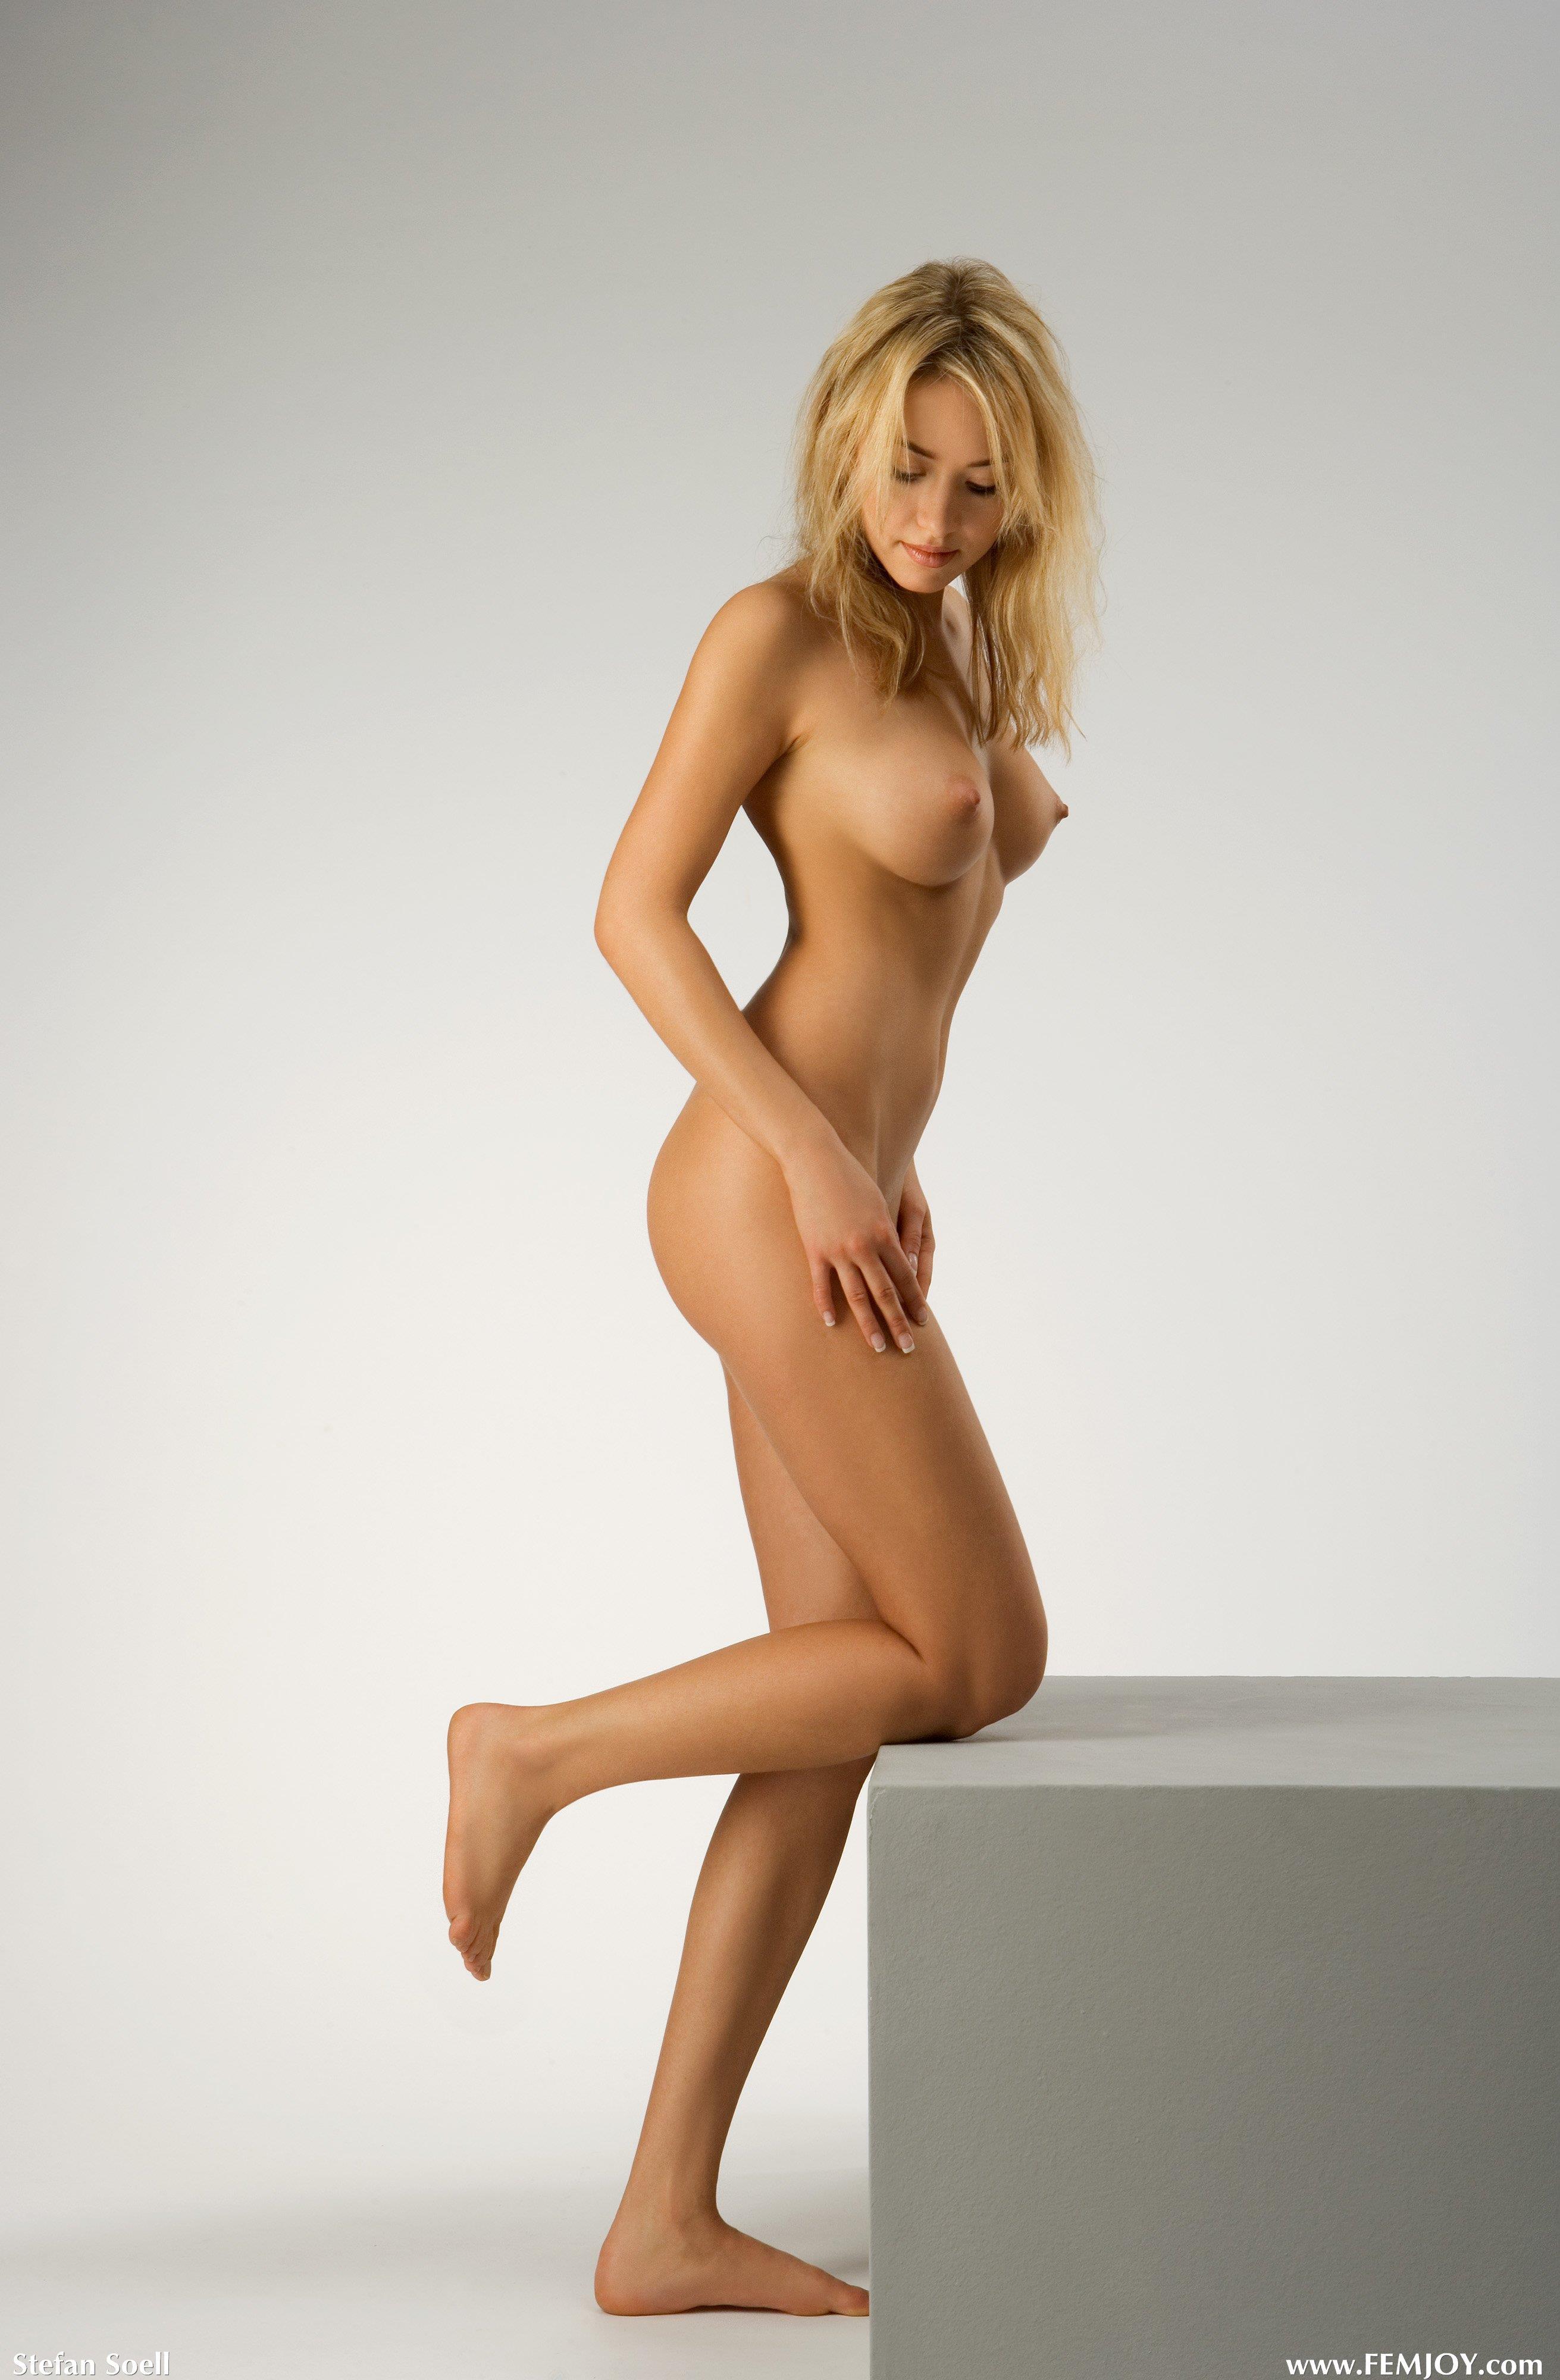 Classic porn stars amy lindsay and belinda gavin - 2 part 4